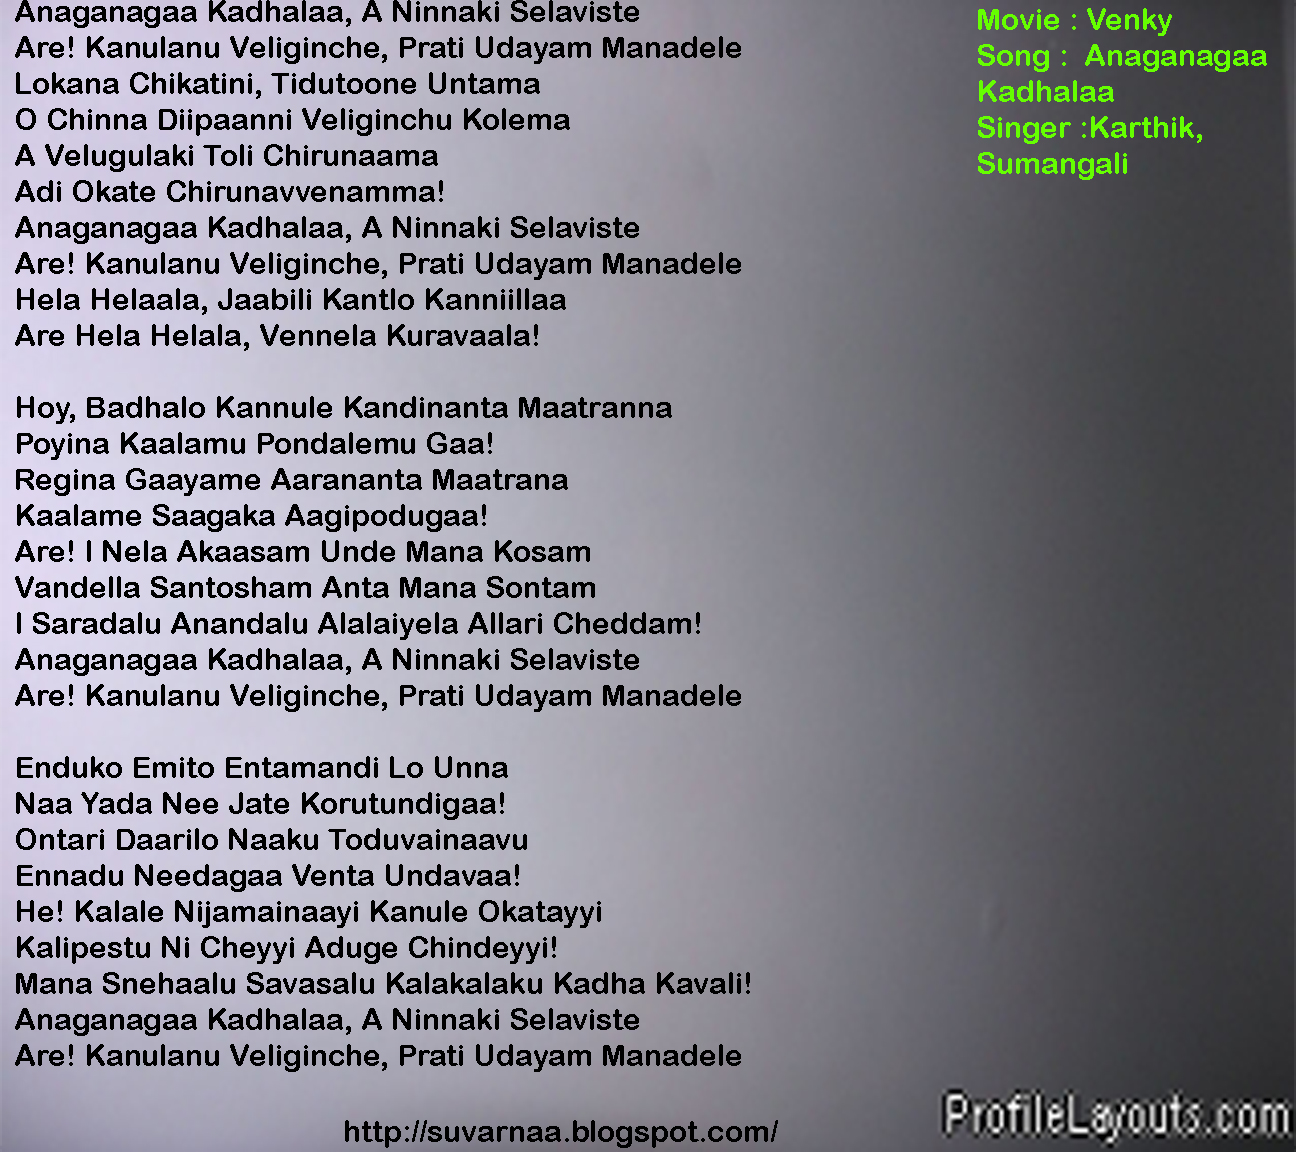 3 (2012) Telugu Mp3 Songs Free Download | AtoZmp3